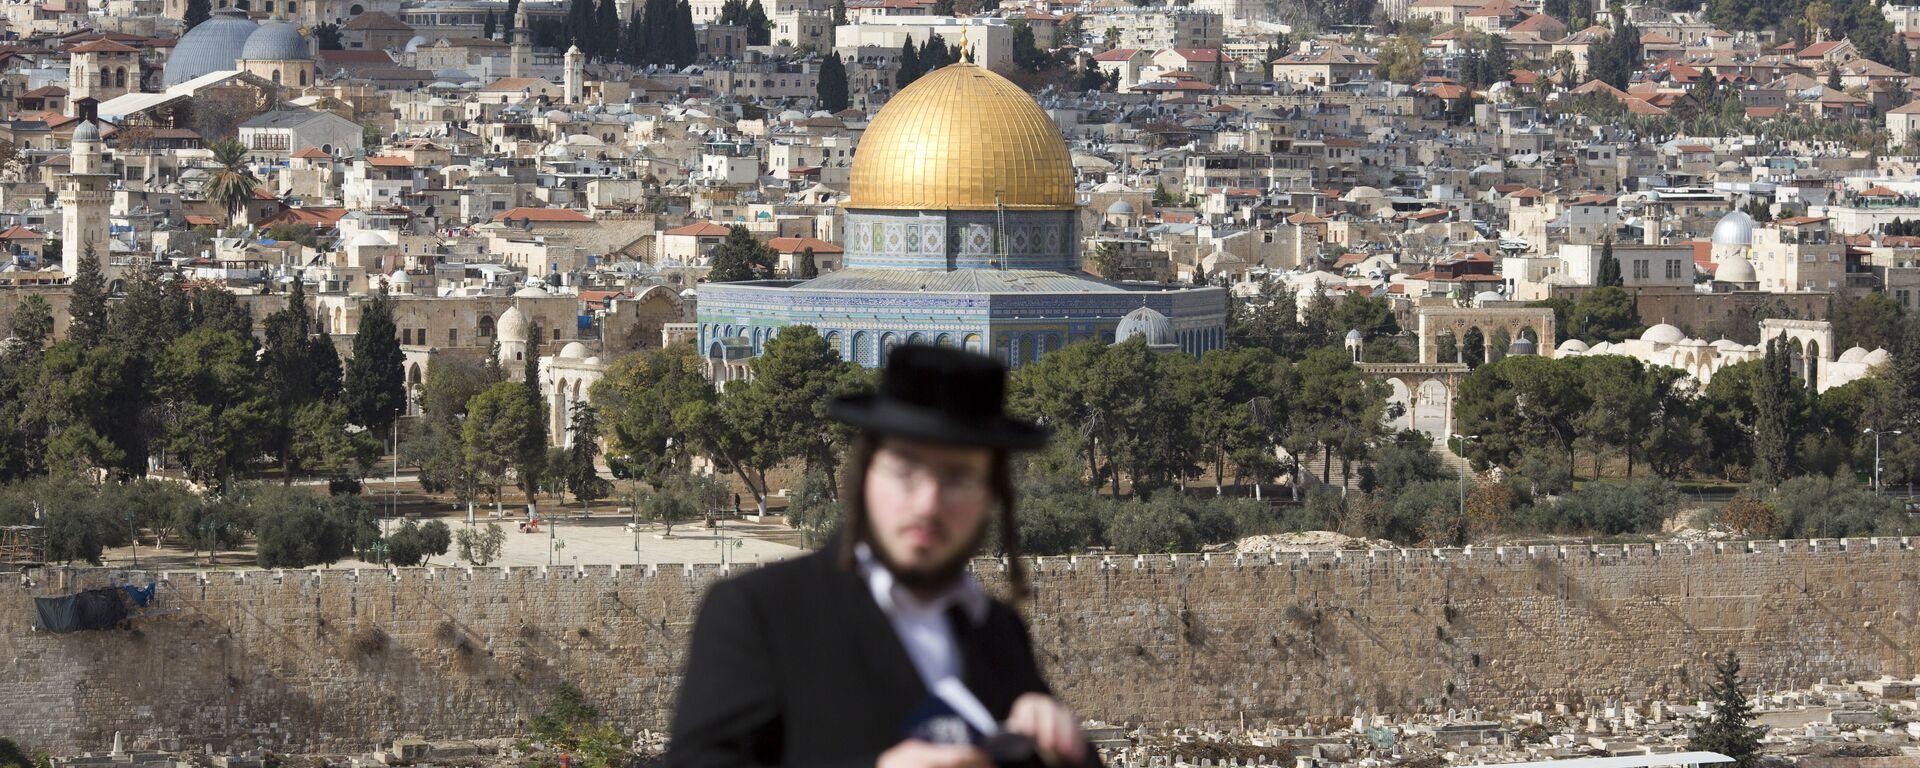 Un judío cerca de la Cúpula de la Roca en Jerusalén - Sputnik Mundo, 1920, 03.03.2021